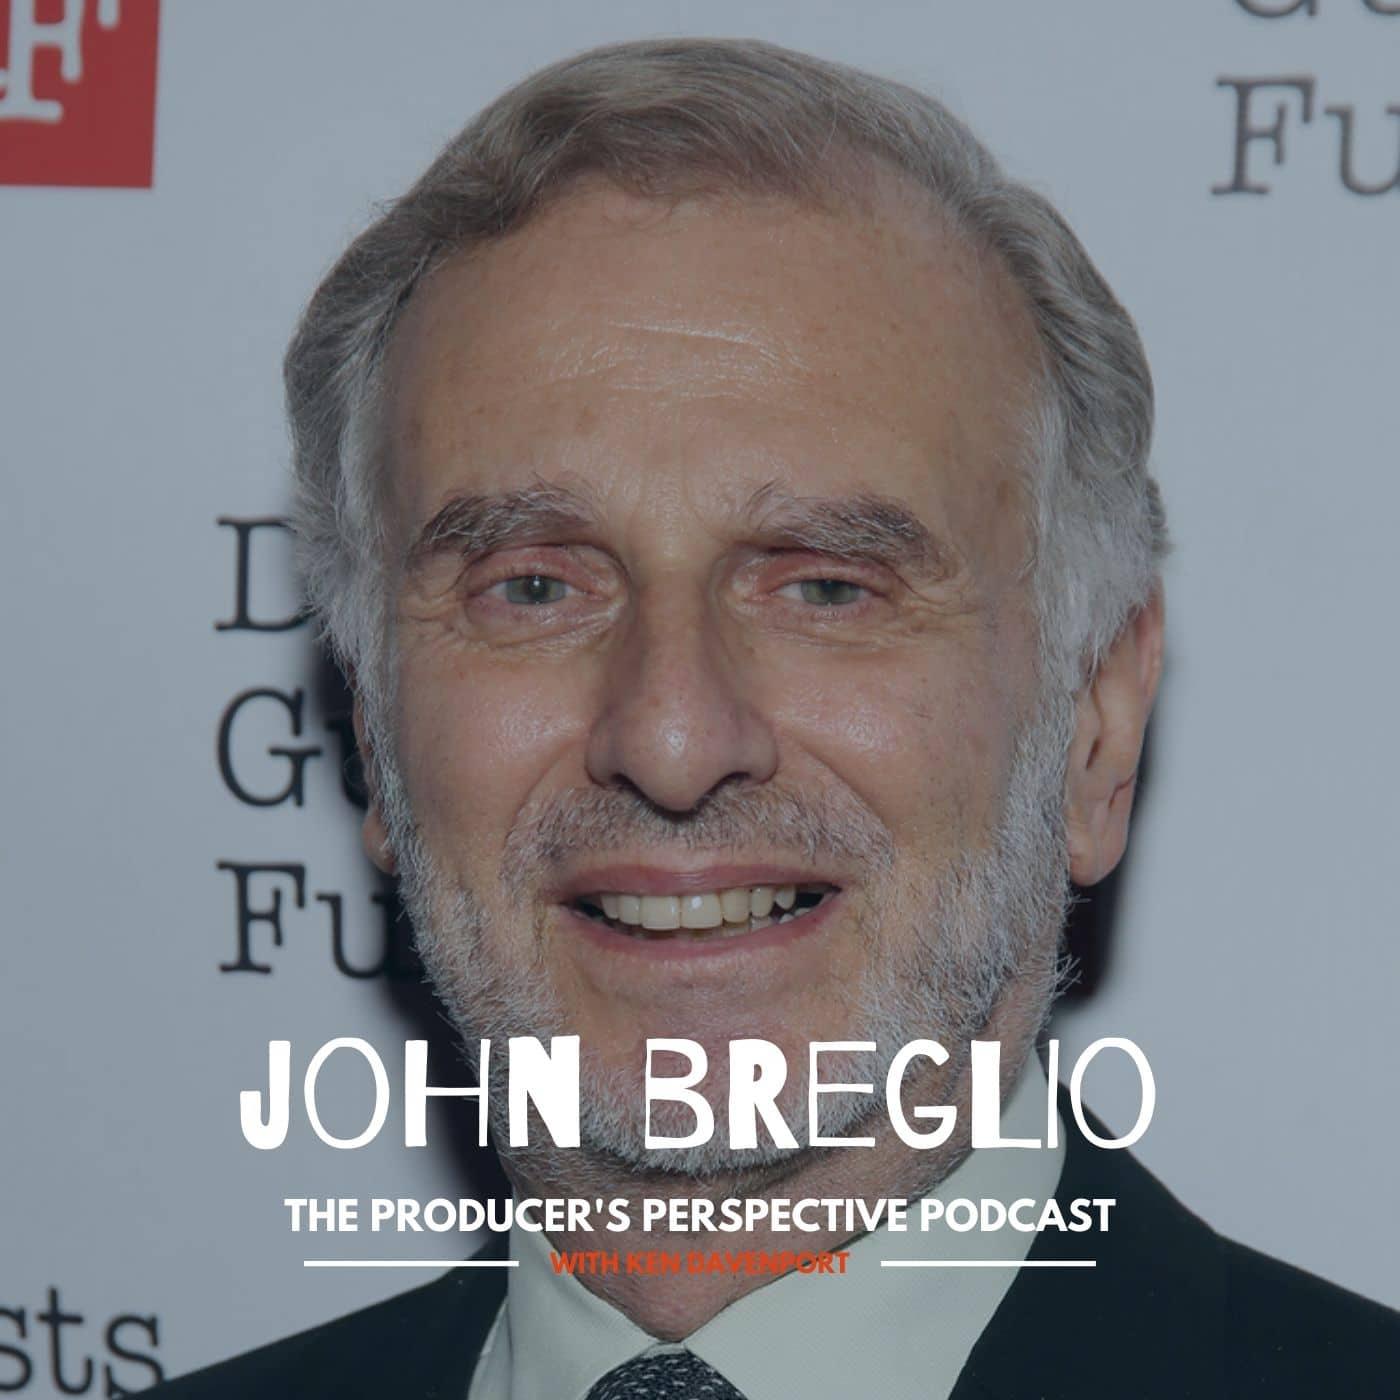 Ken Davenport's The Producer's Perspective Podcast Episode 24 - John Breglio